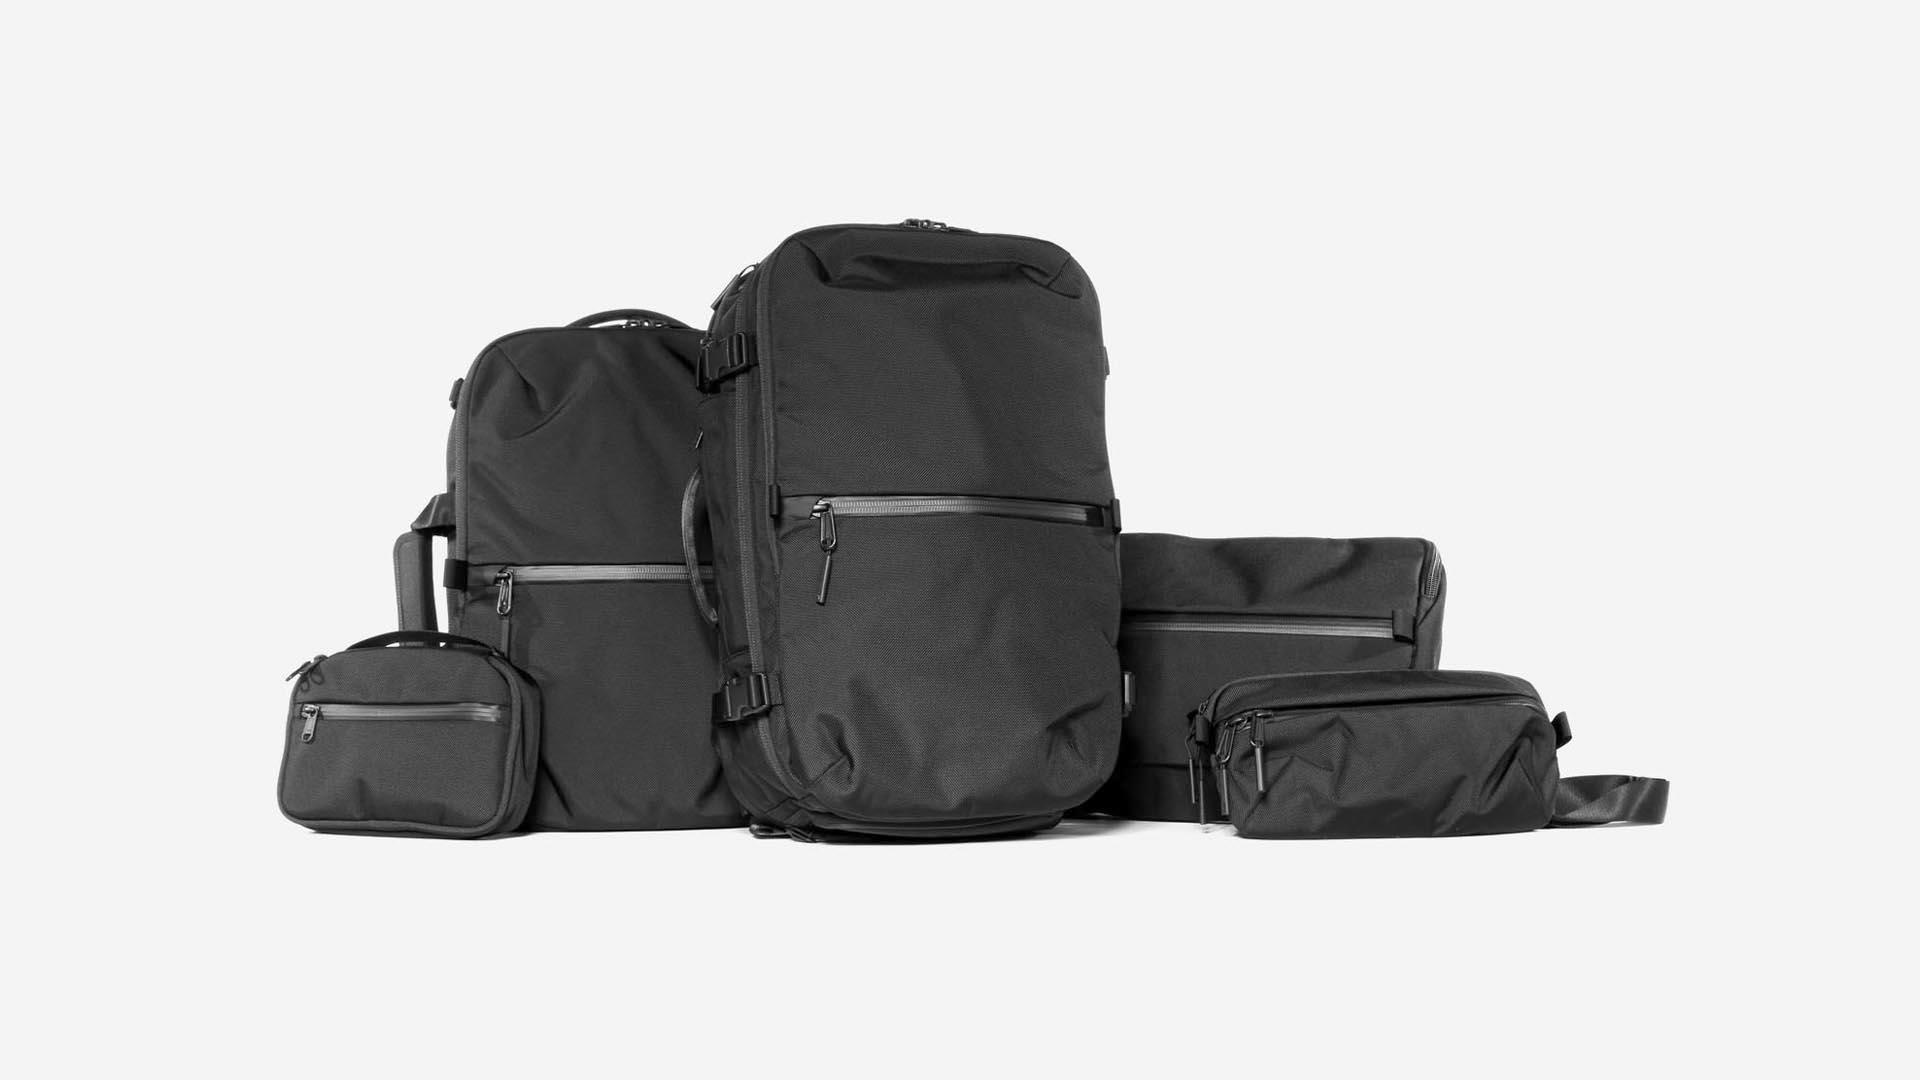 ea70ee37 Aer   Modern gym bags, travel backpacks and laptop backpacks ...